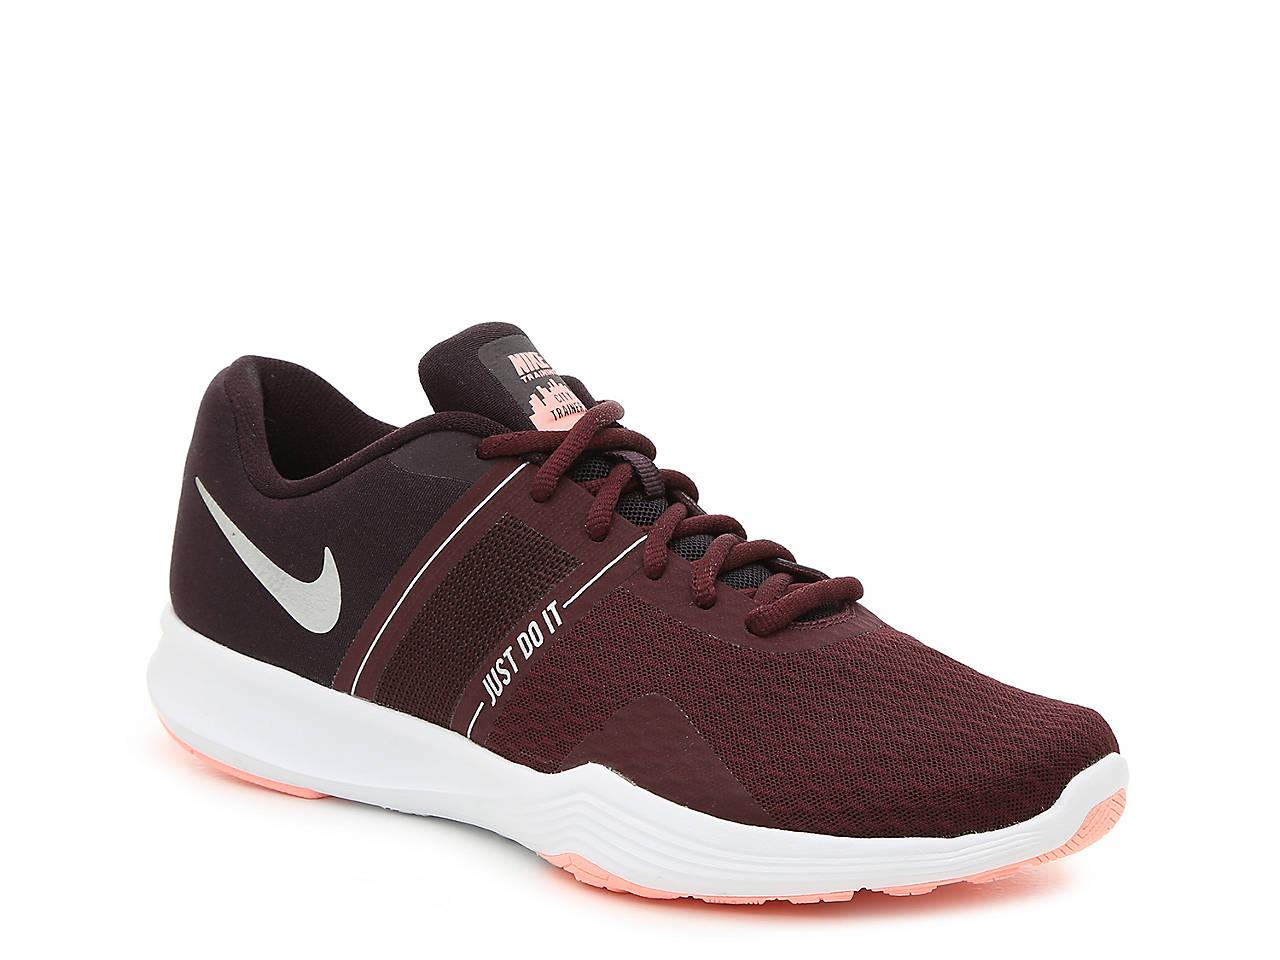 69deb092f9afc Nike City Trainer 2 Lightweight Training Shoe - Women's Women's ...